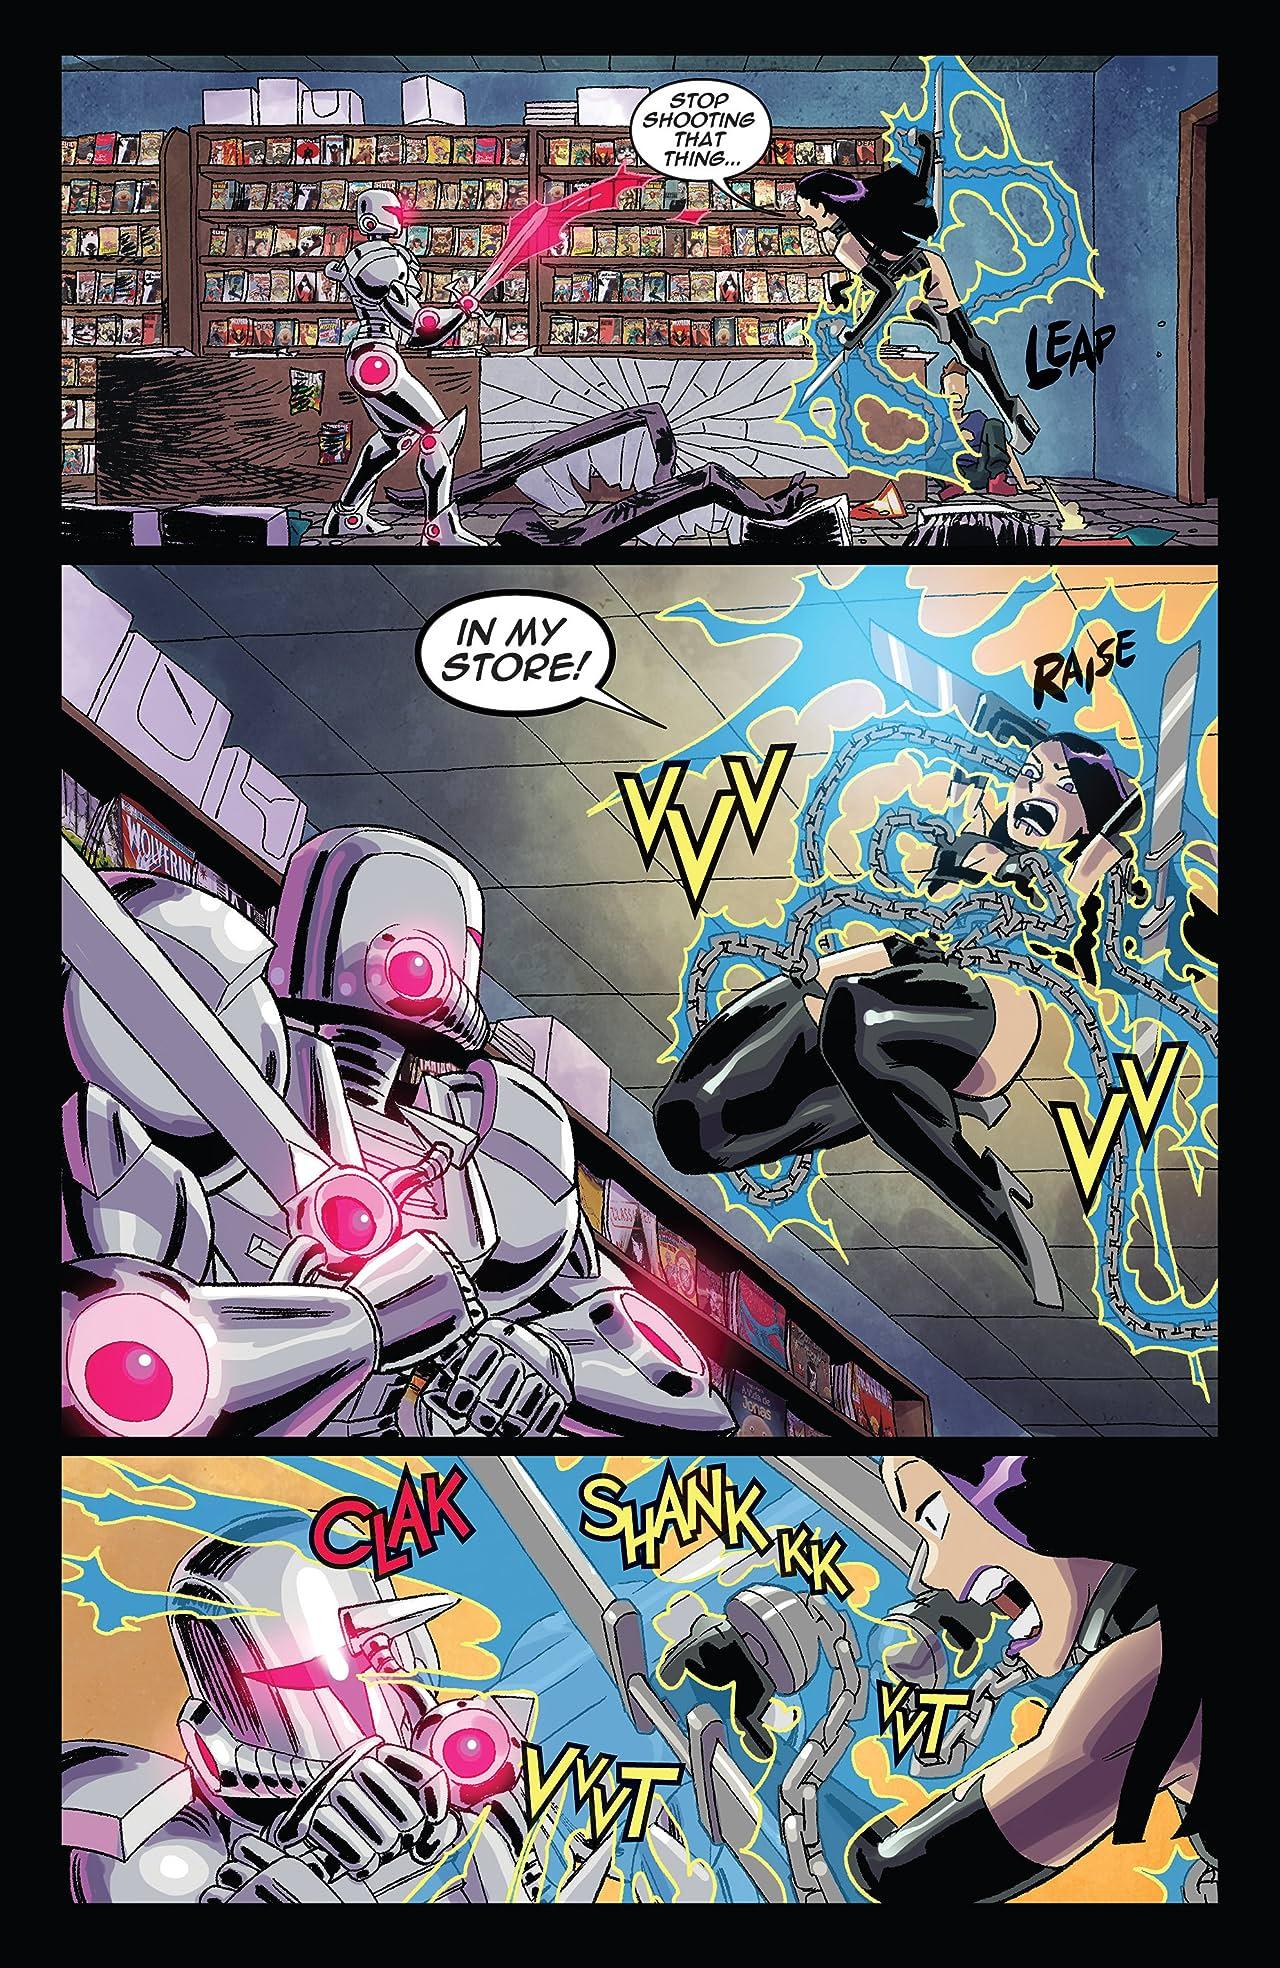 Vampblade #6